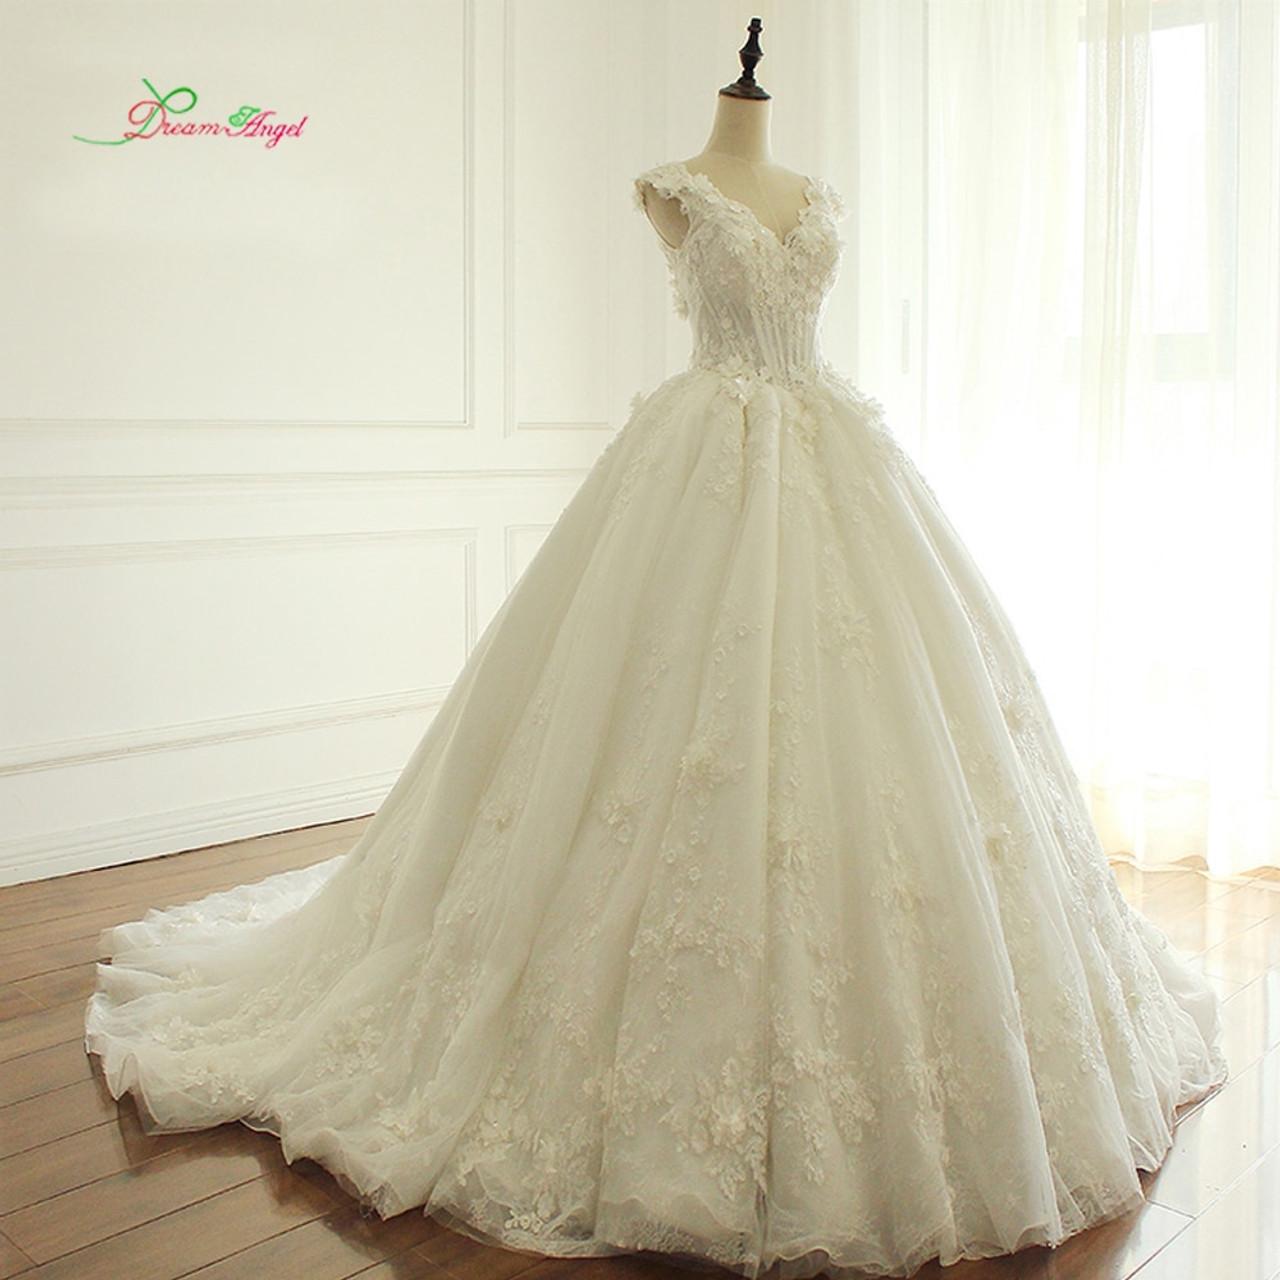 cded2b0db5f0 Dream Angel Elegant Flowers Lace Princess Wedding Dress 2019 Beading  Appliques Vintage Bride dresses Robe De ...